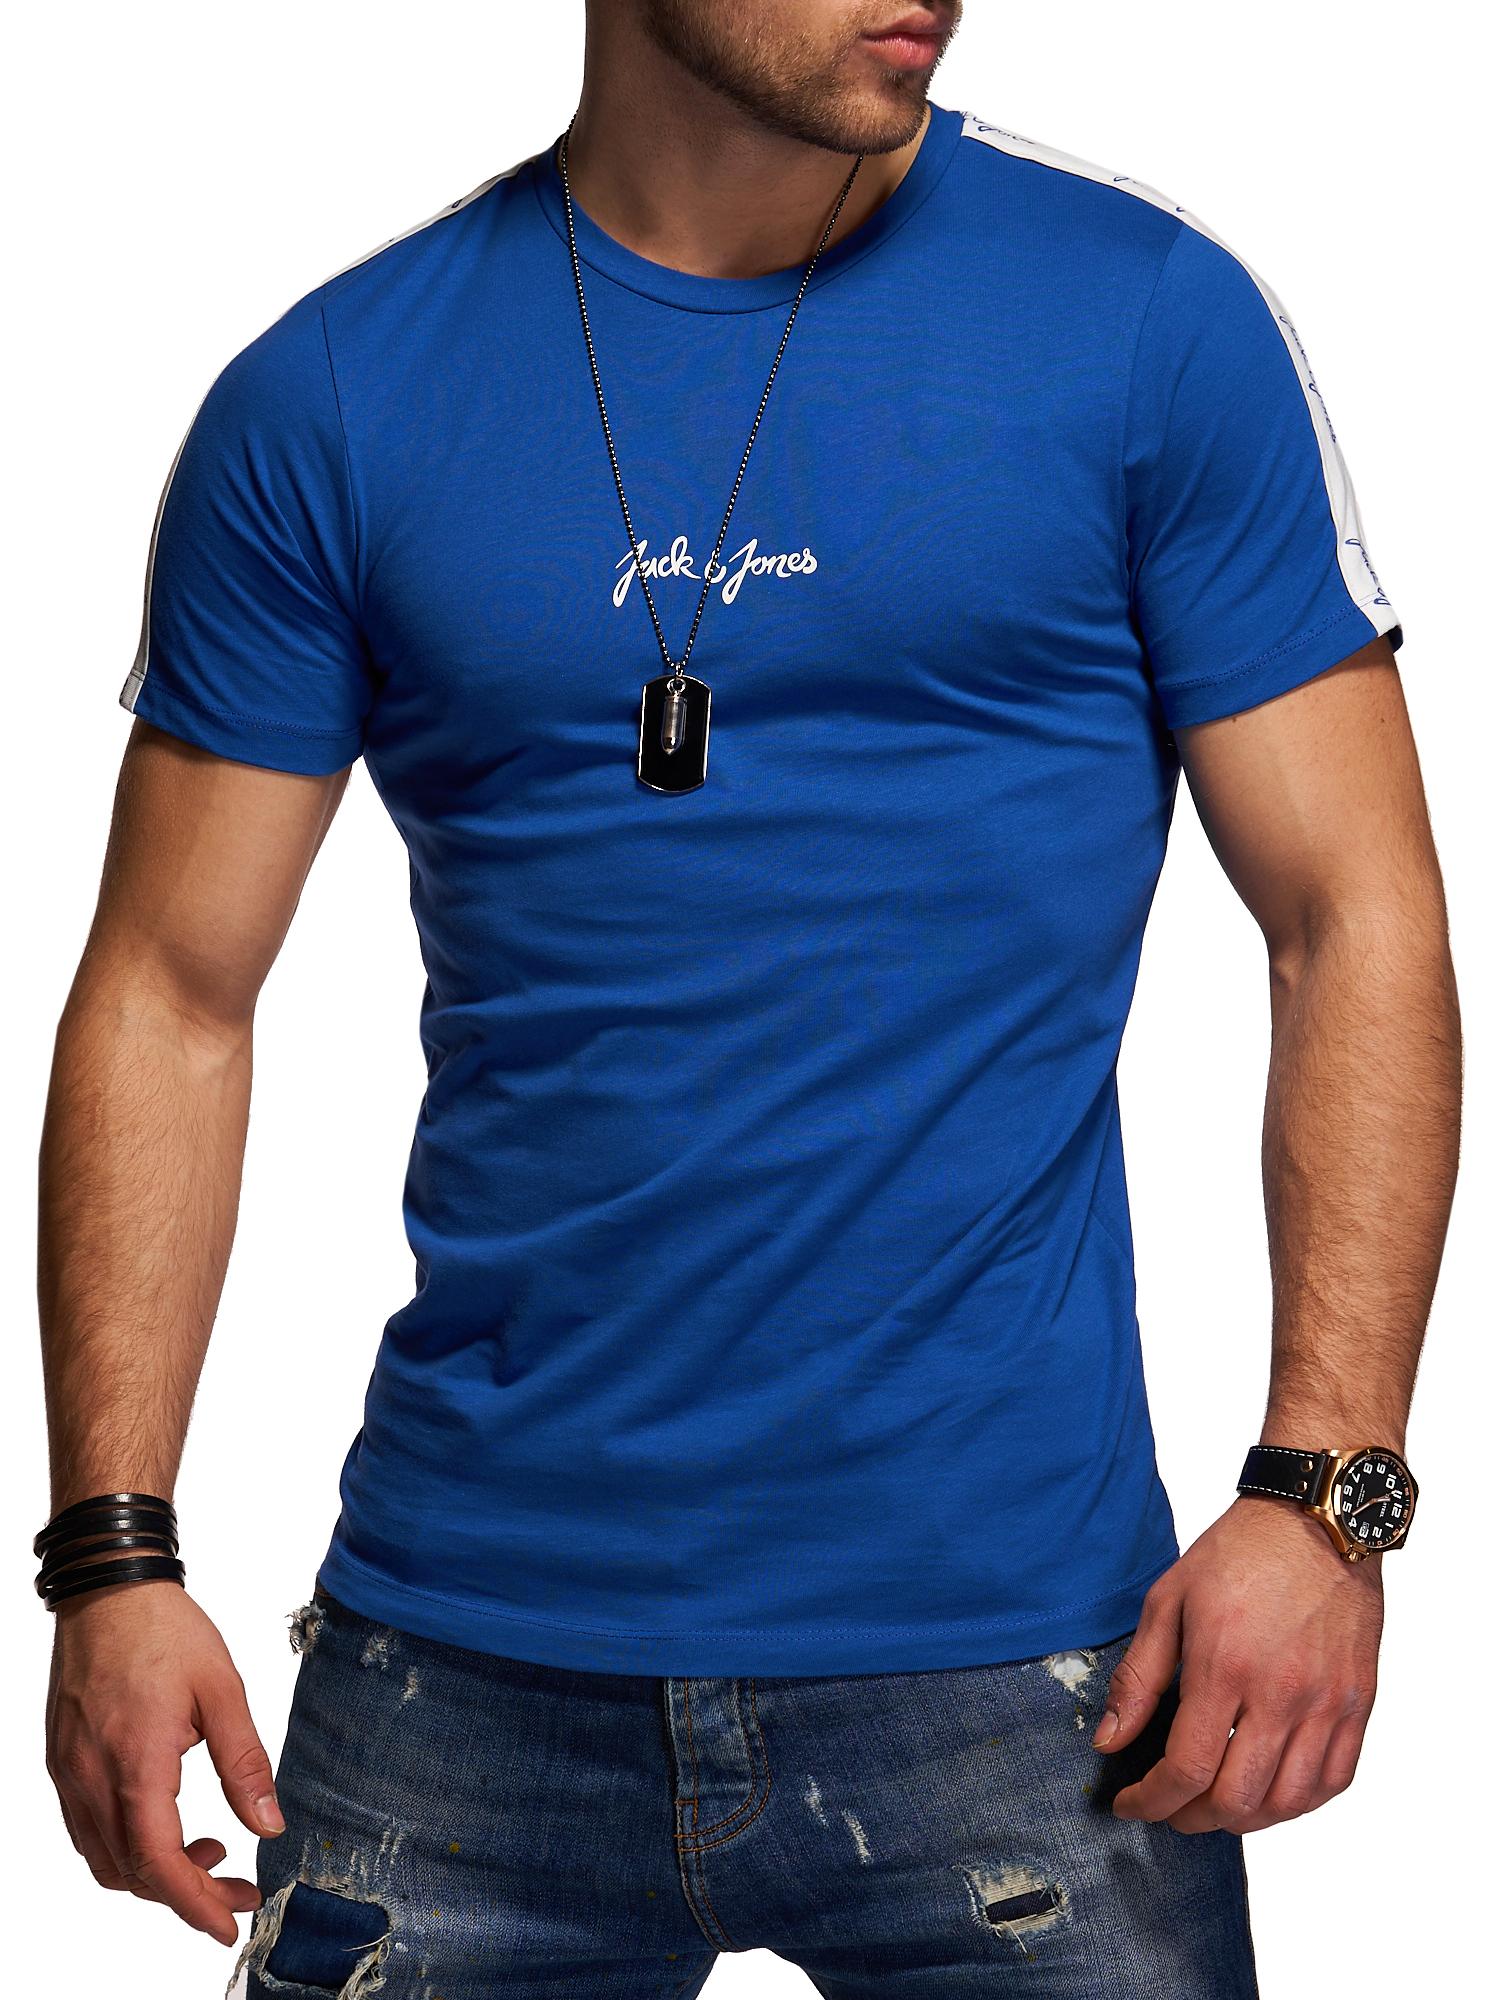 Jack-amp-Jones-T-Shirt-Hommes-Manches-Courtes-Shirt-HOMME-Shirt-Shirt-Basic-Casual-Print miniature 7